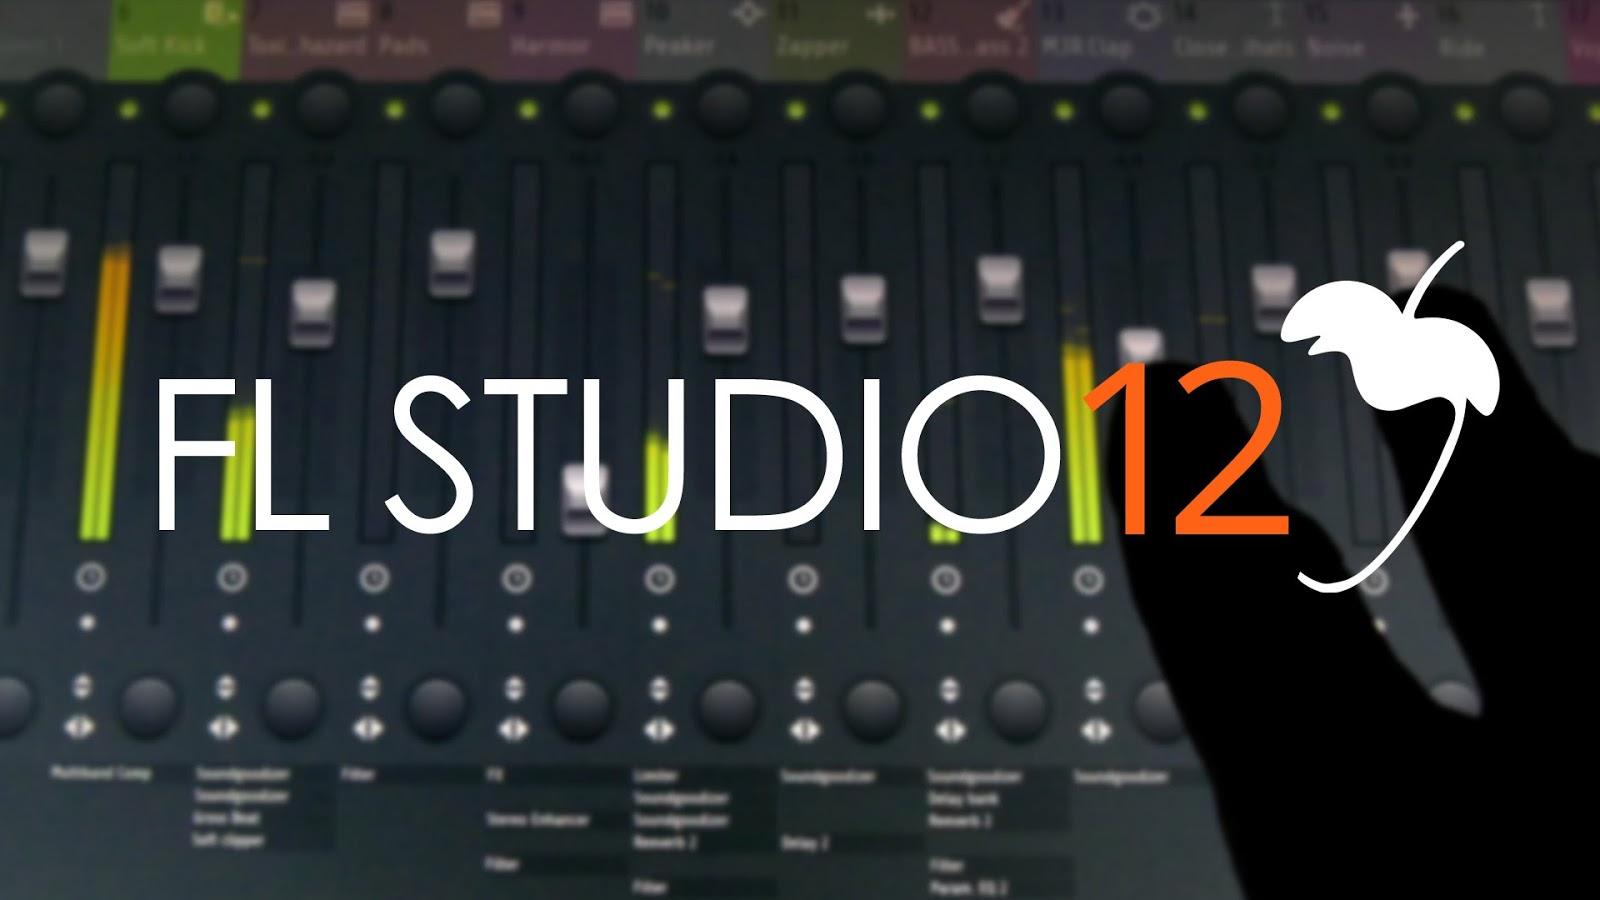 Fl studio 12 download google drive